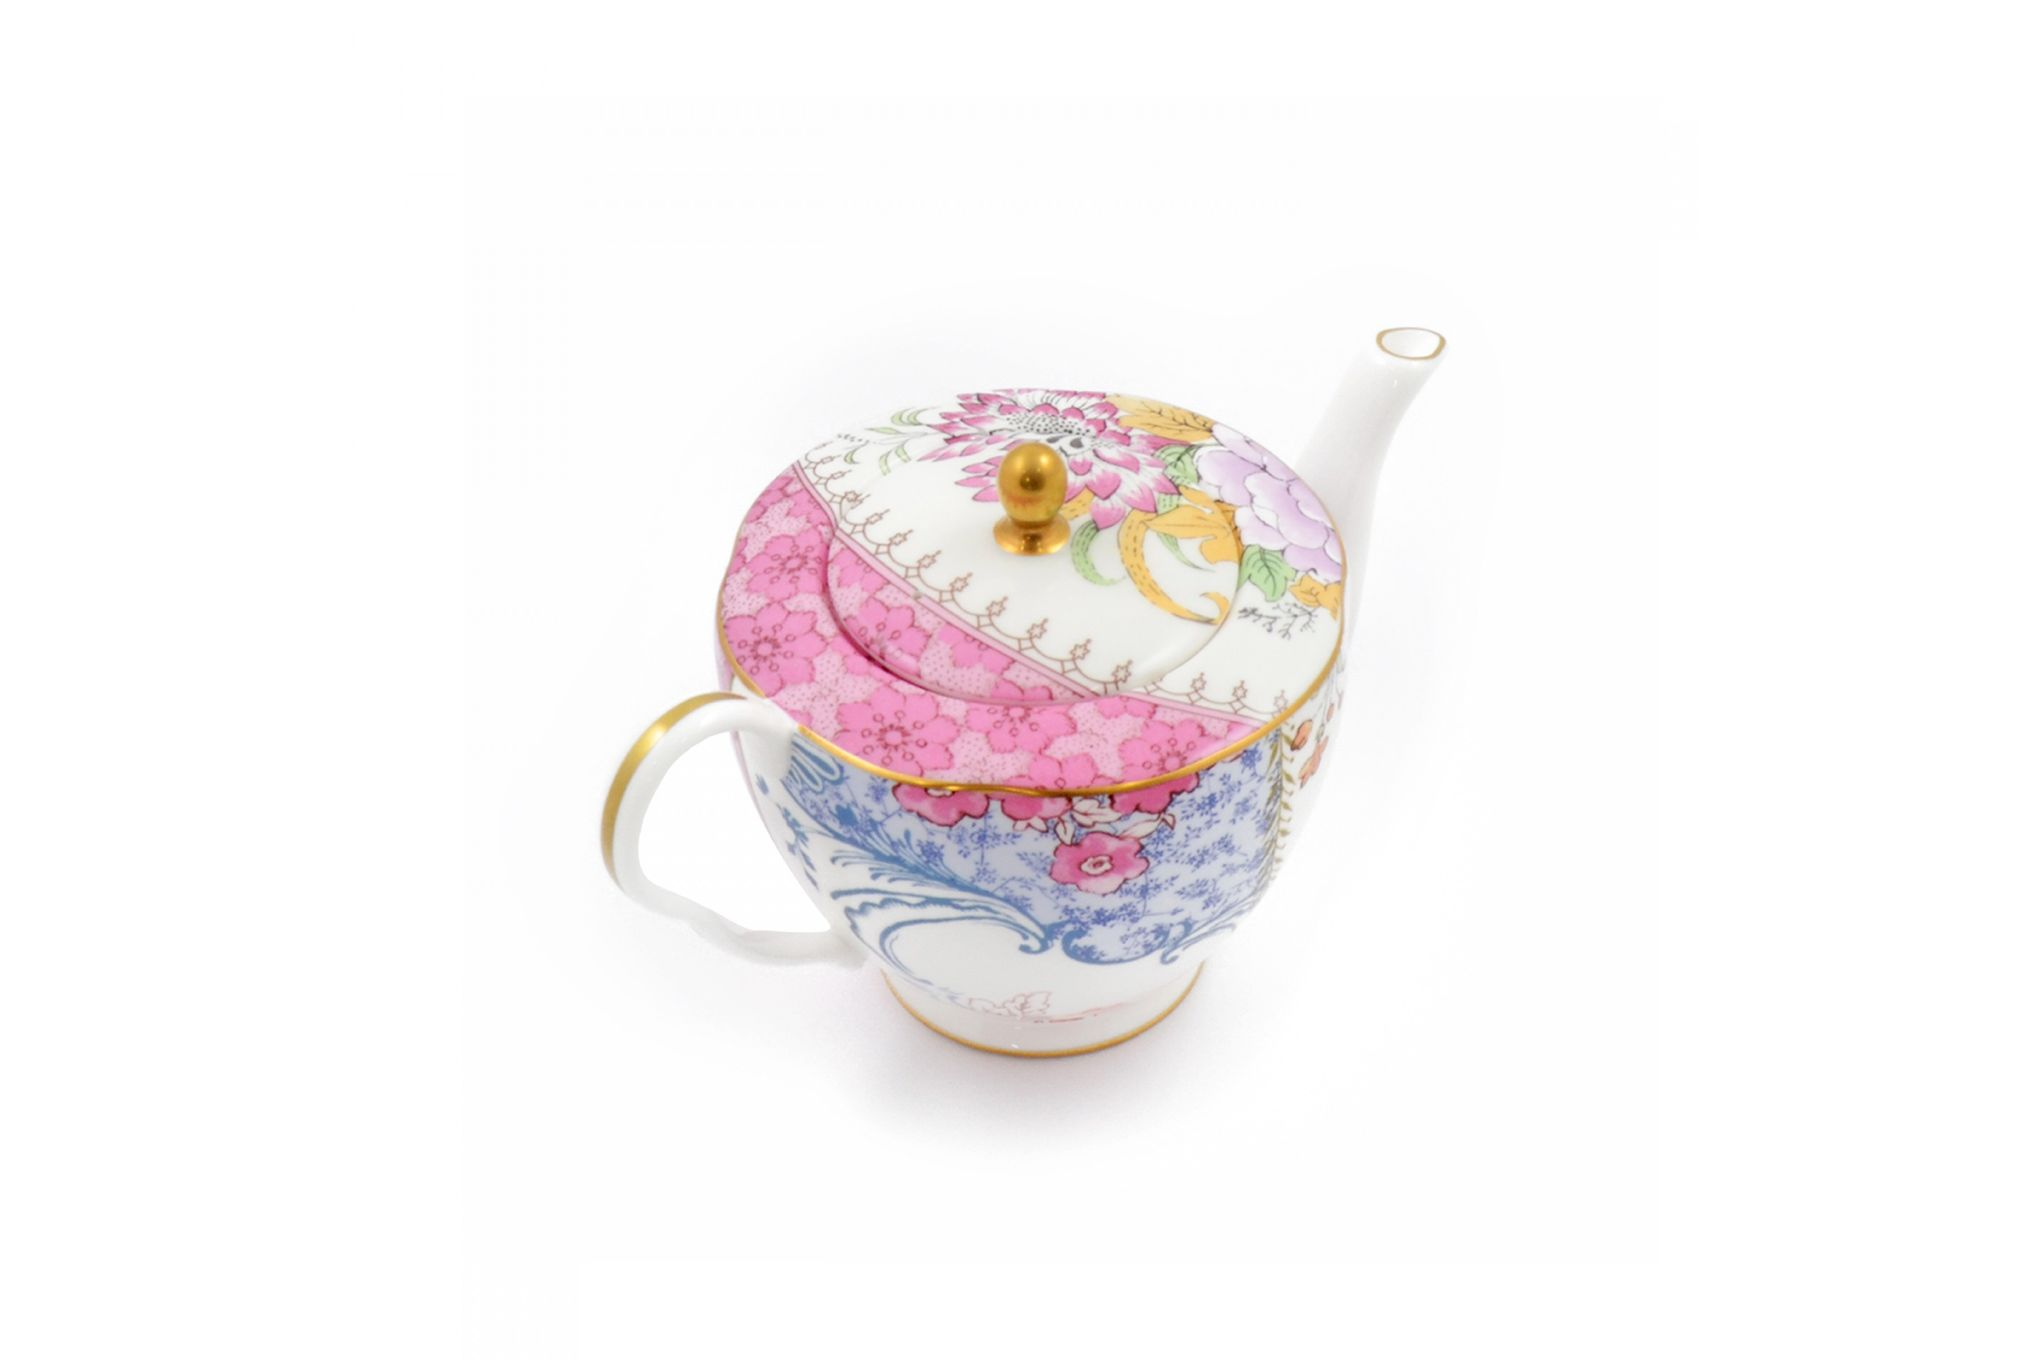 Wedgwood Butterfly Bloom Teapot 0.37l thumb 4